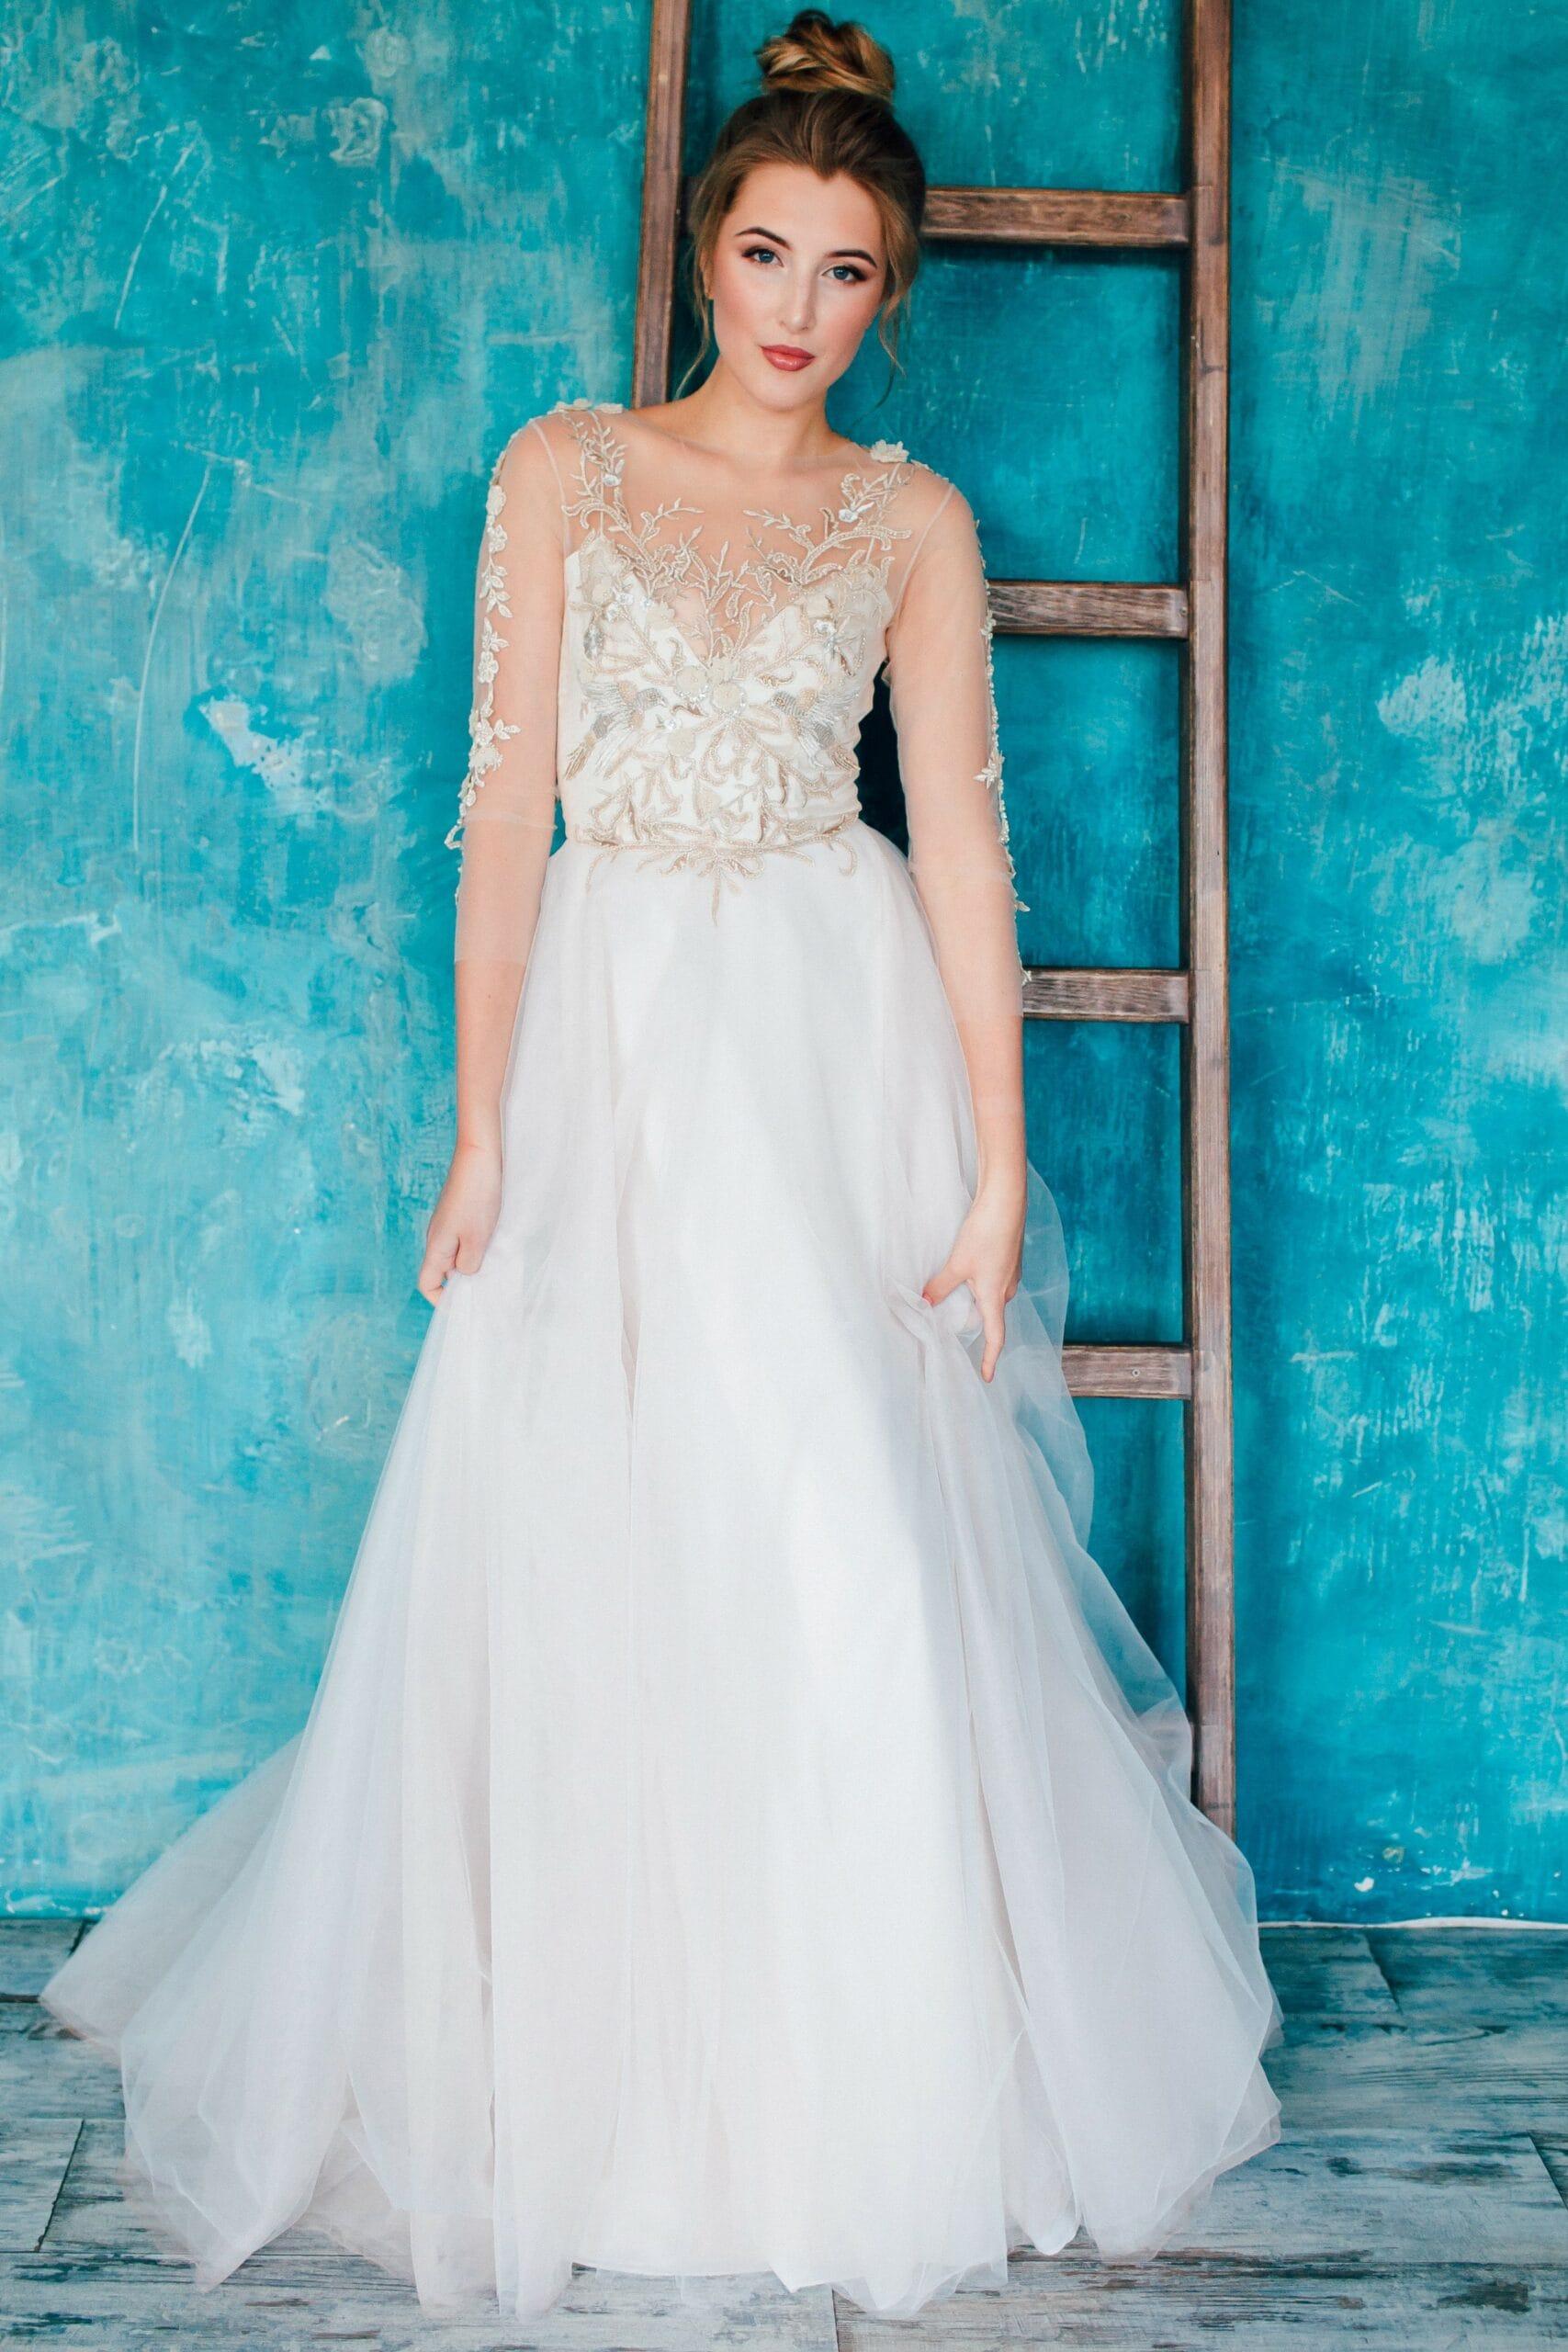 Свадебное платье ARIELA, коллекция THE ANGELS, бренд RARE BRIDAL, фото 2